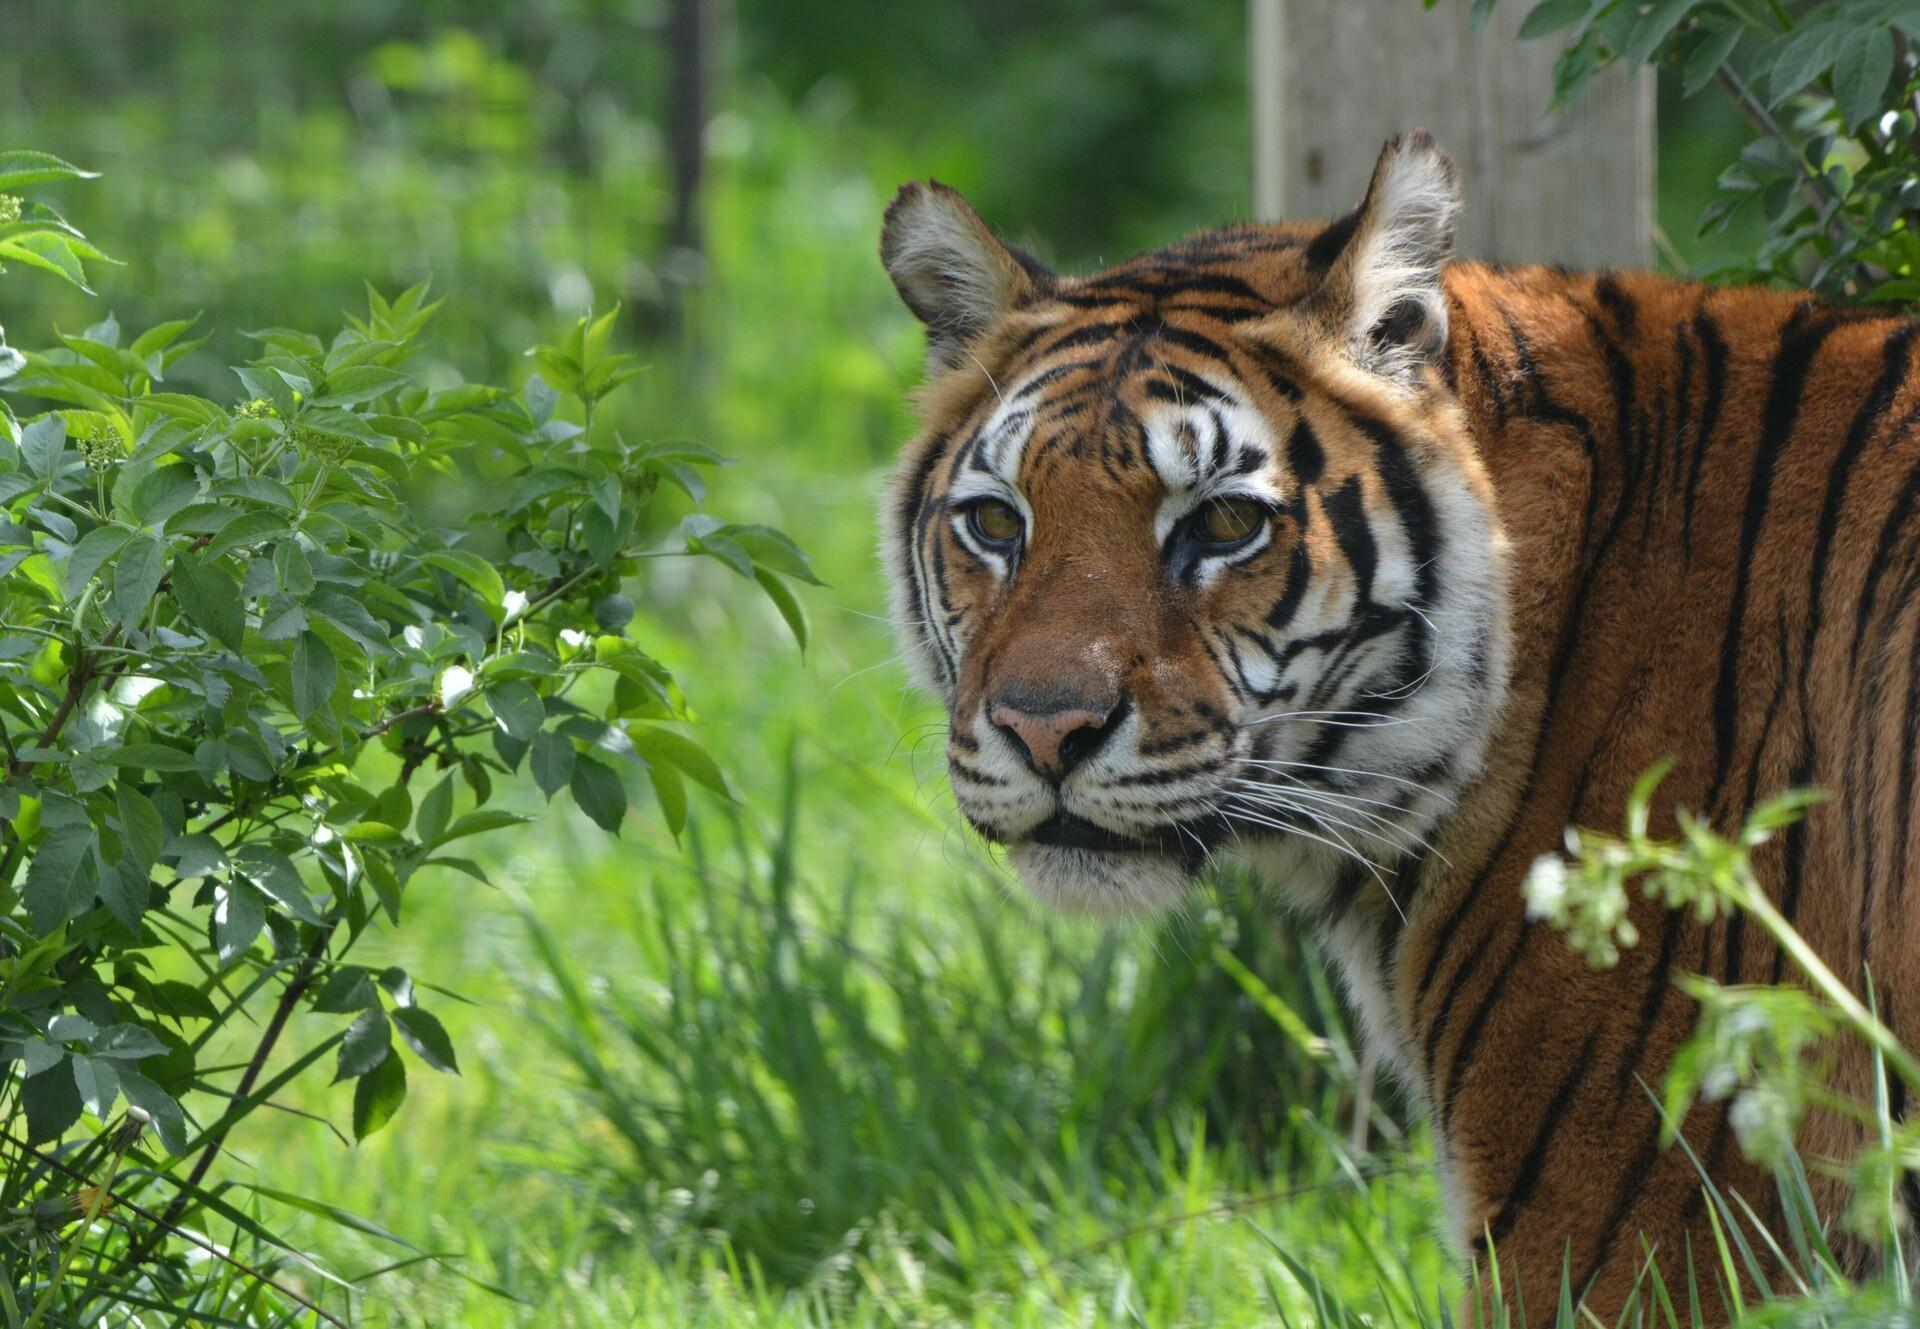 Tiger Jill at TIERART